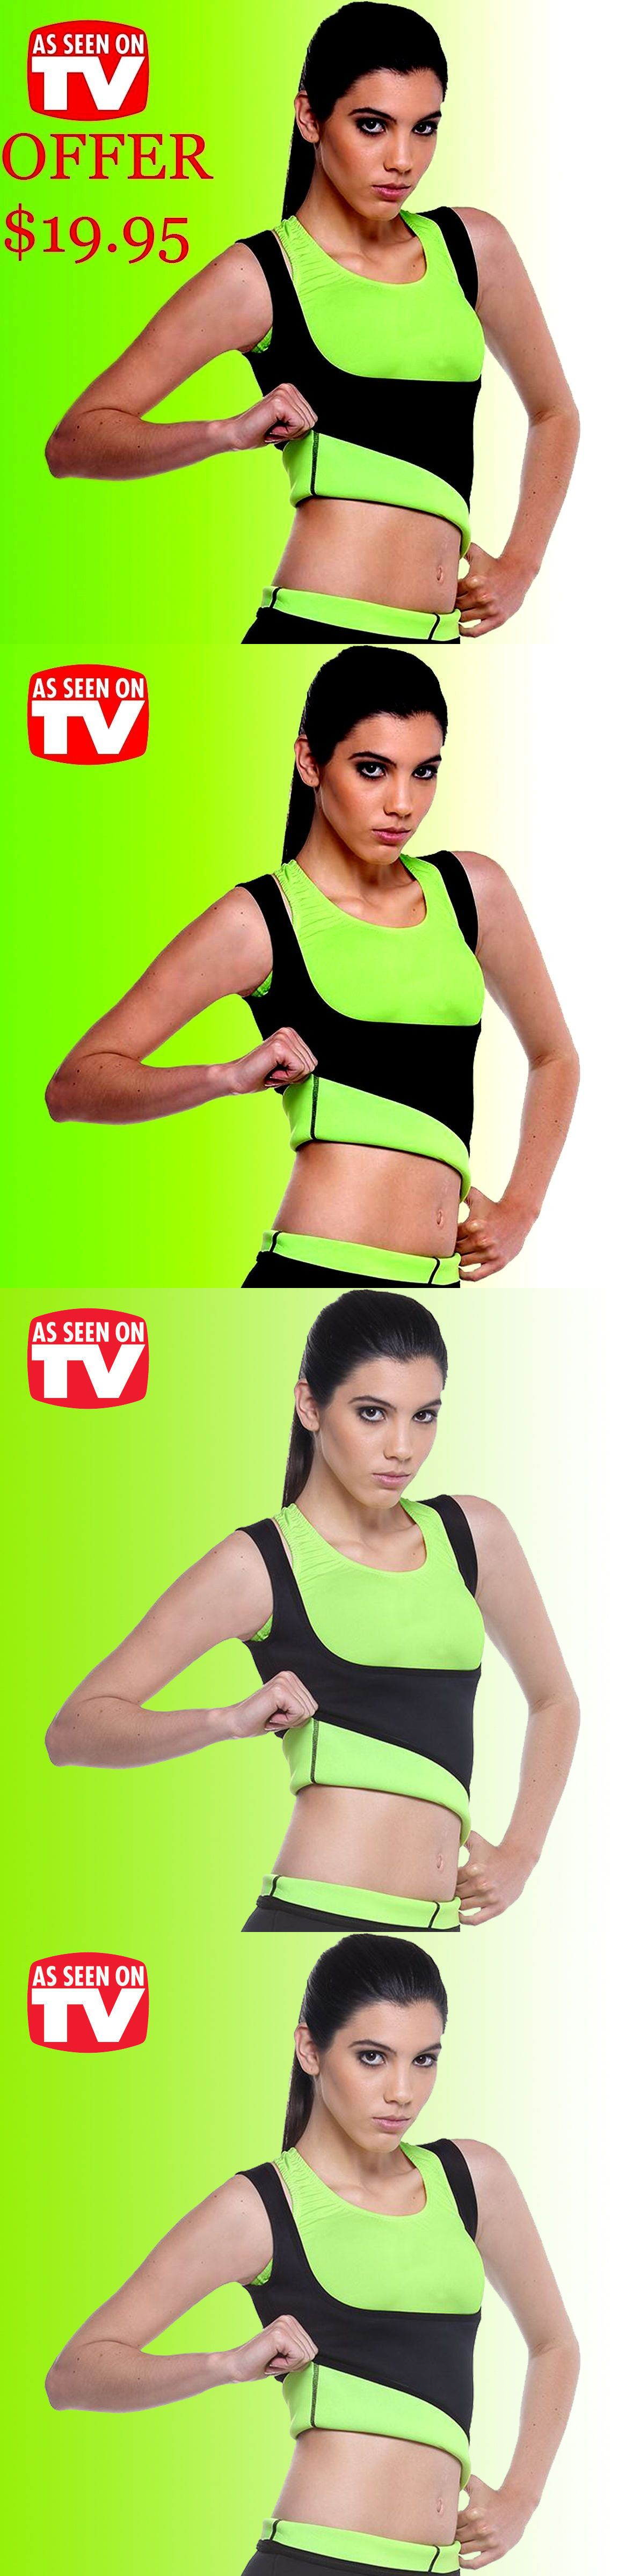 c1bc71e84f Other Womens Fitness Clothing 13360  Medium Cami Redushaper Shaper Shirt  Neoprene Mujer Slimmingbelt Hot Redu